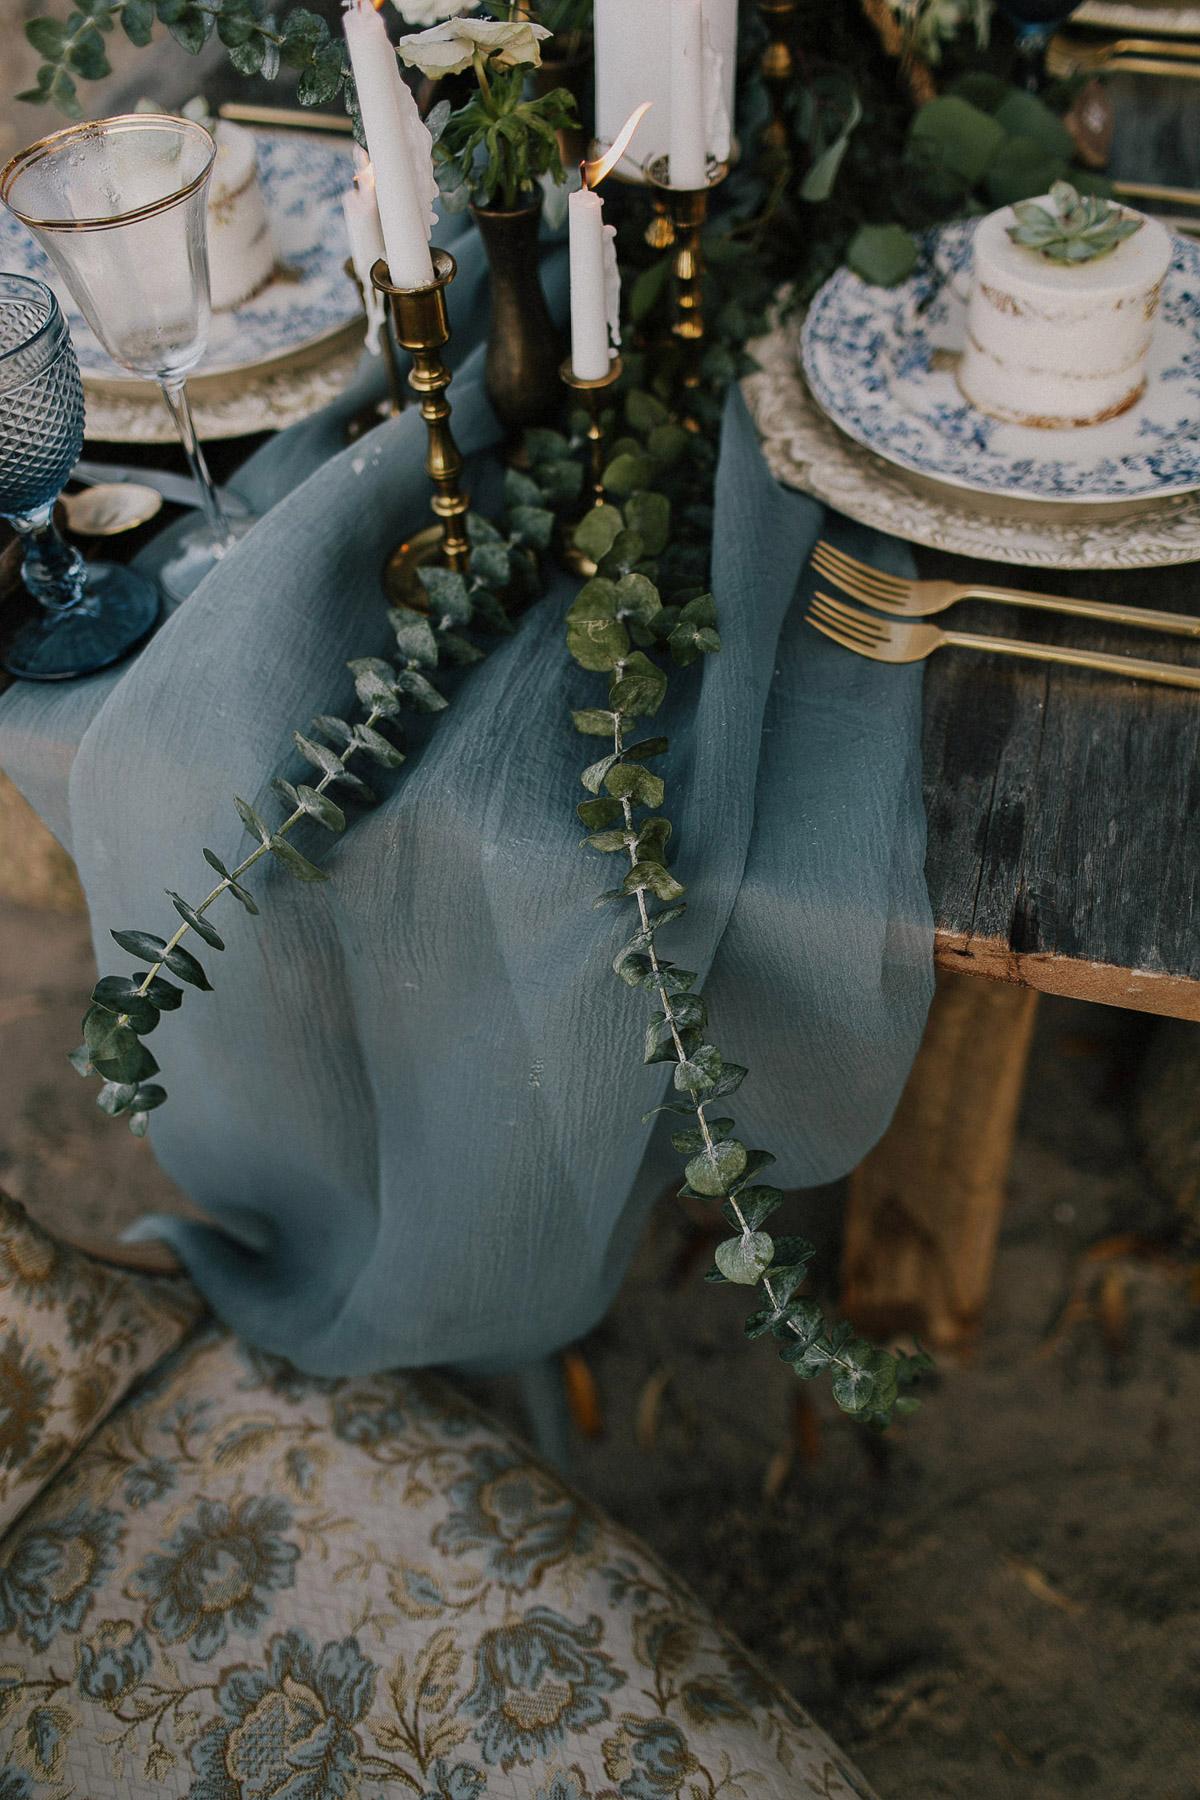 ballad-photography-vineyard-bride-swish-list-niagara-seaside-wedding-editorial-28.jpg